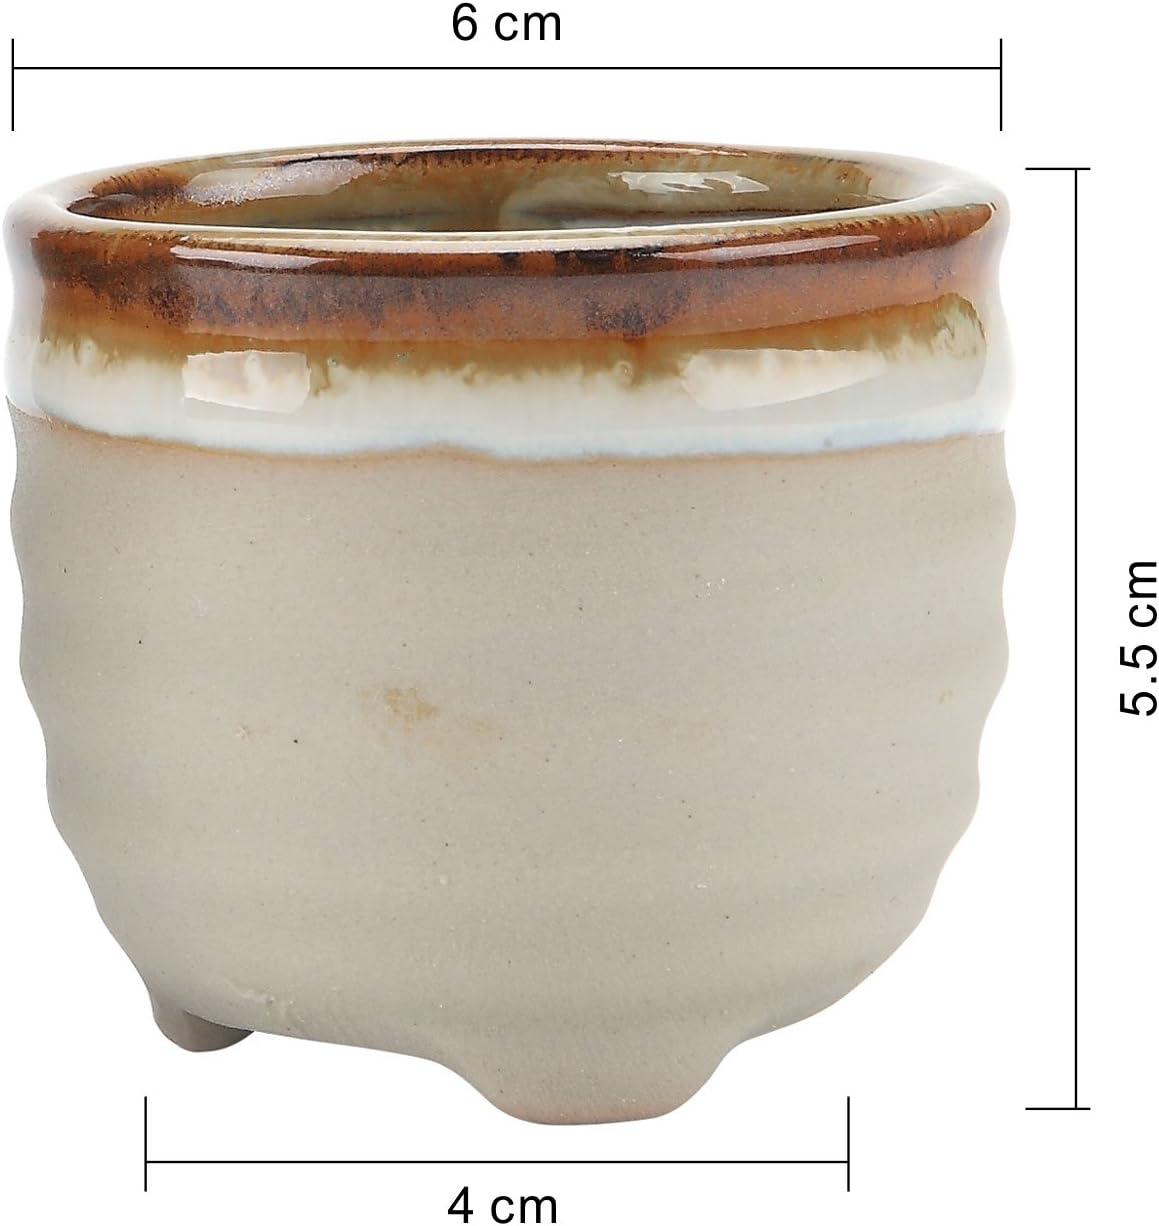 T4U 2.25 Inch Ceramic Flowing Glaze Solid Gray Base Serial Ring Form Shape Succulent Plant Pot Cactus Plant Pot Flower Pot Container Planter